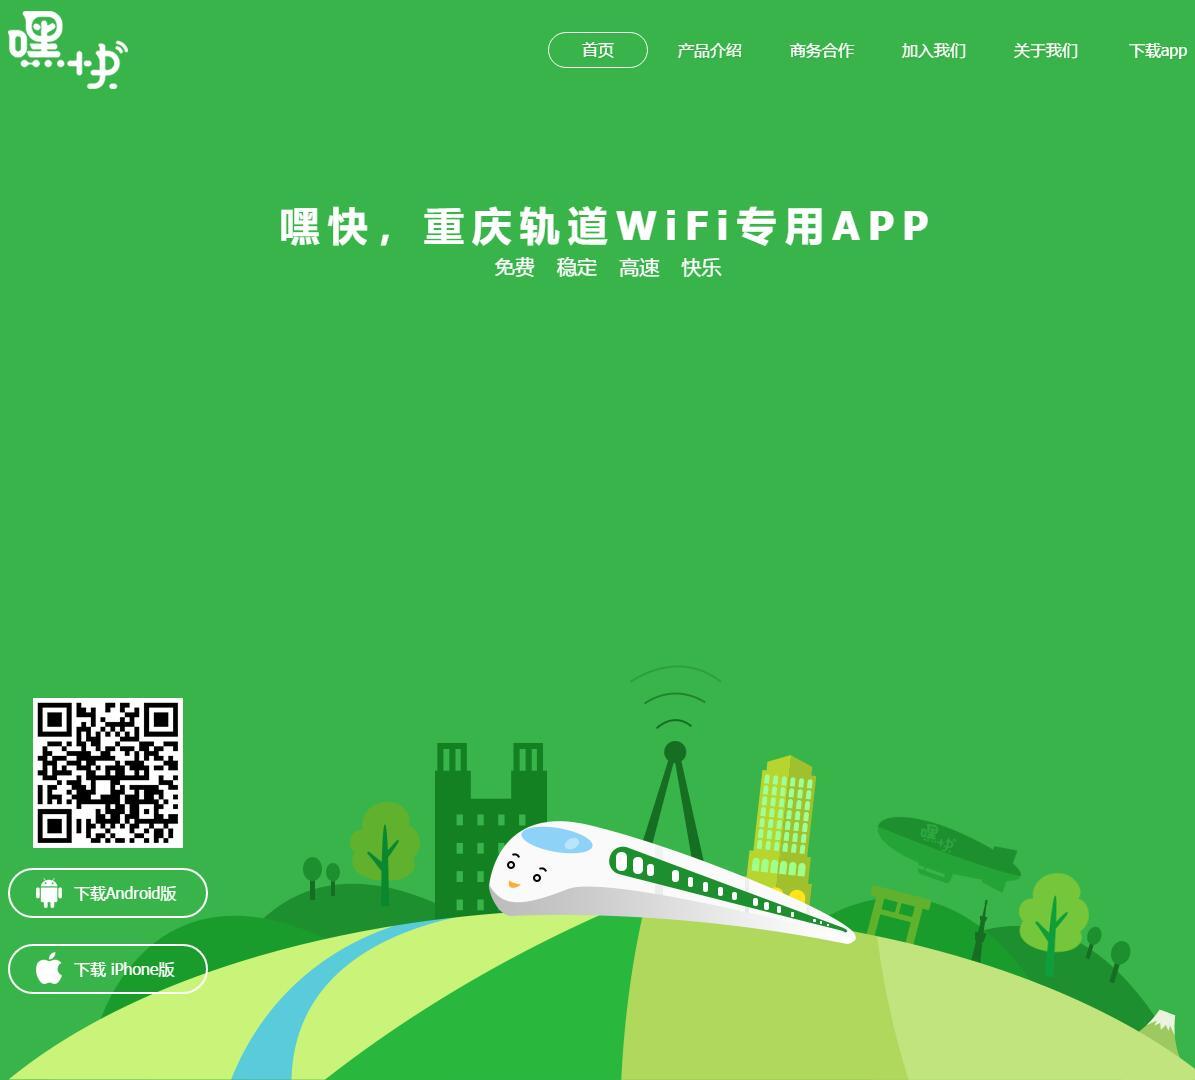 HTML5全屏绿色大气APP宣传推广下载网页模板